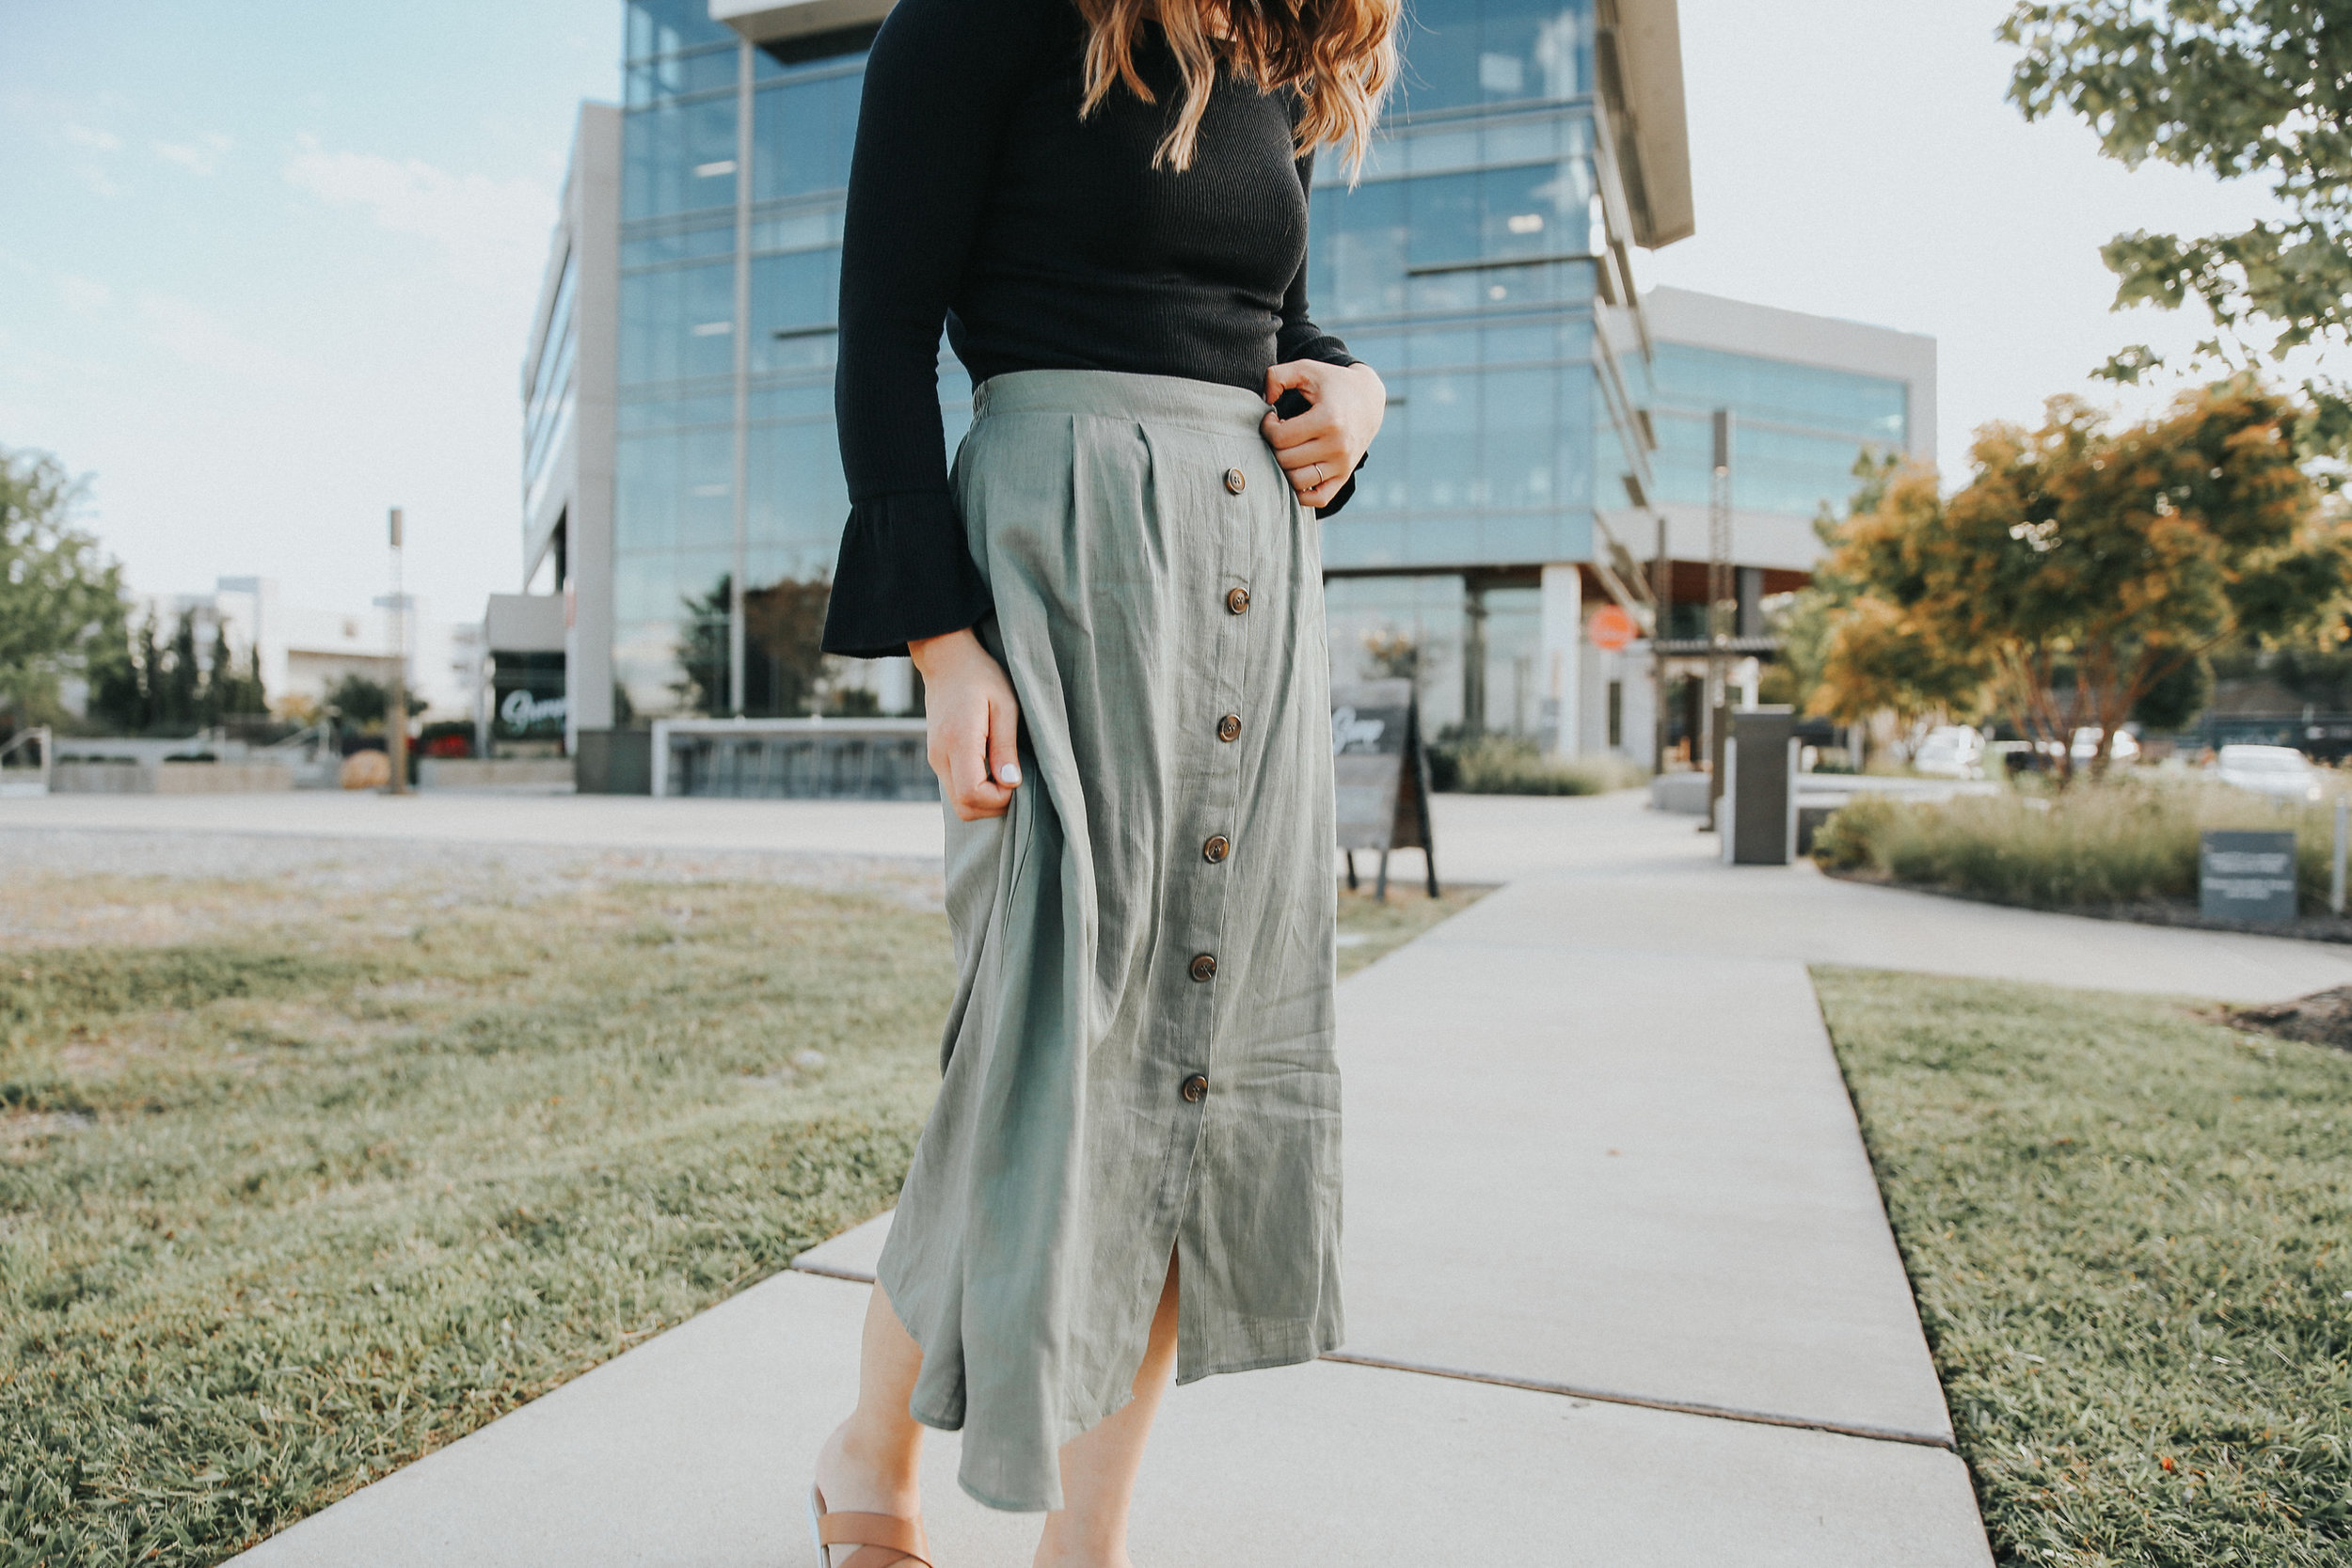 womens long skirt and top.jpg